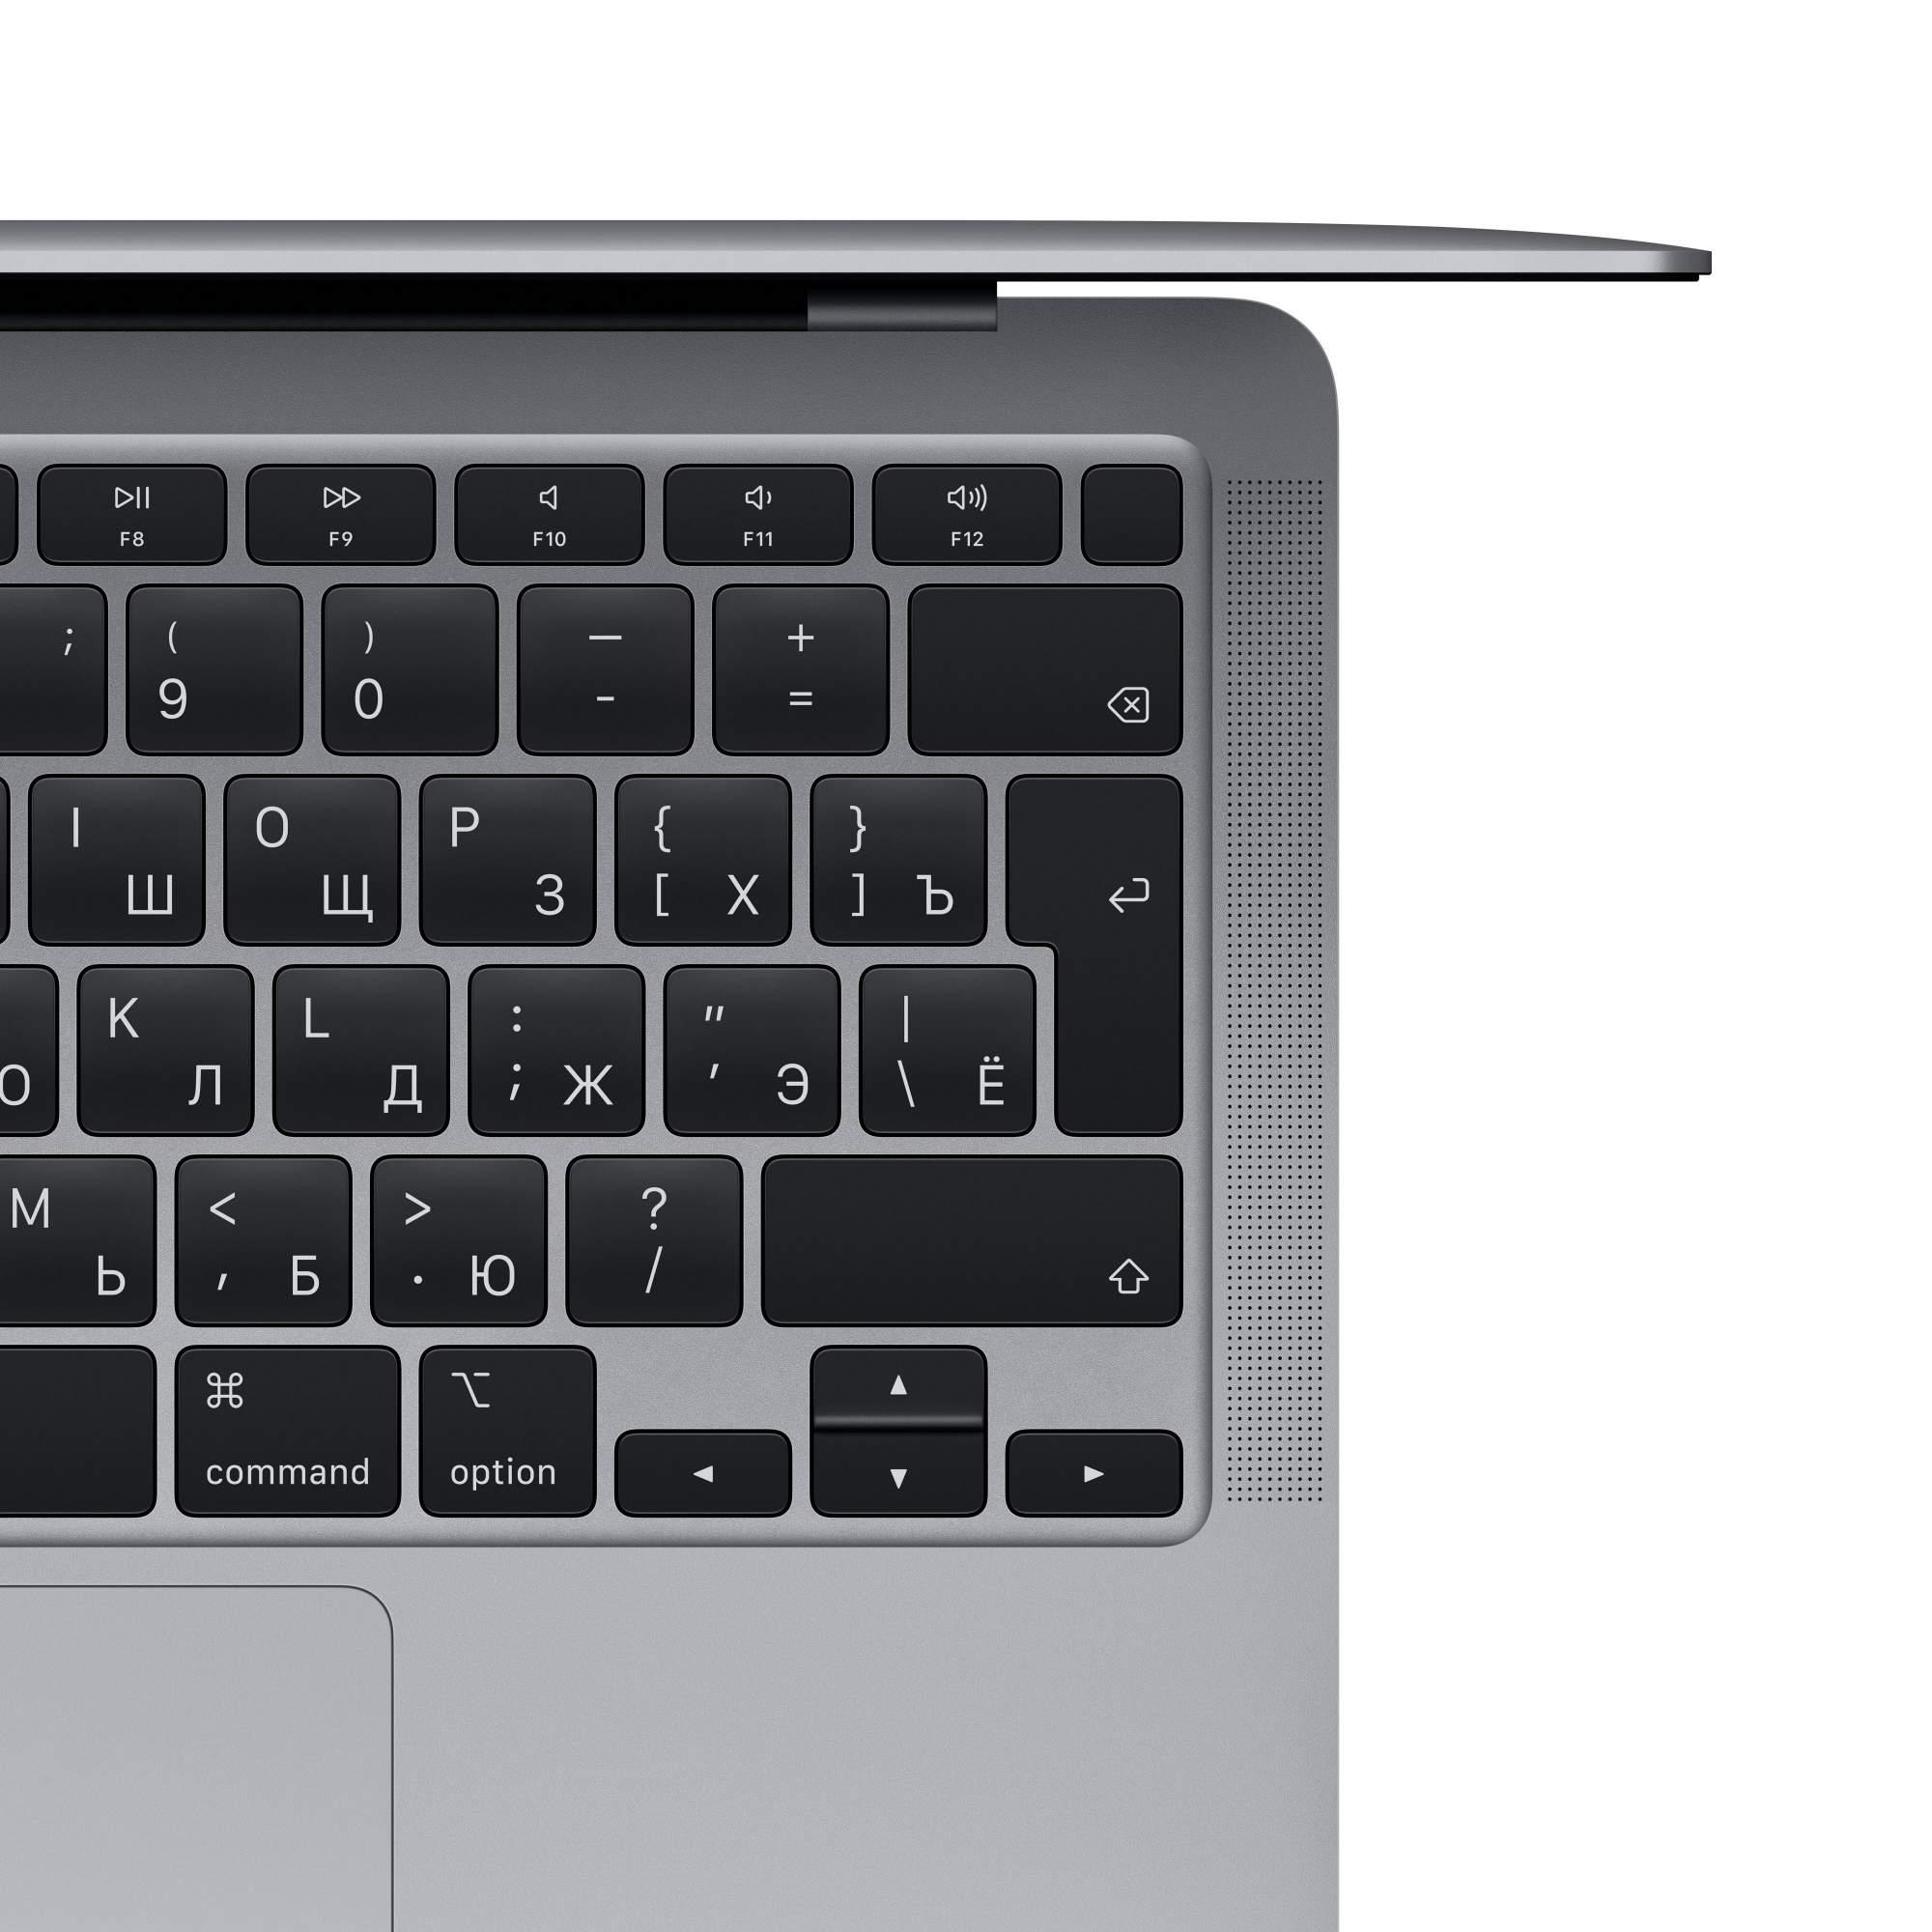 ноутбук Apple MacBook Air 2020 M1/8GB/256GB Space Gray (MGN63RU/A)